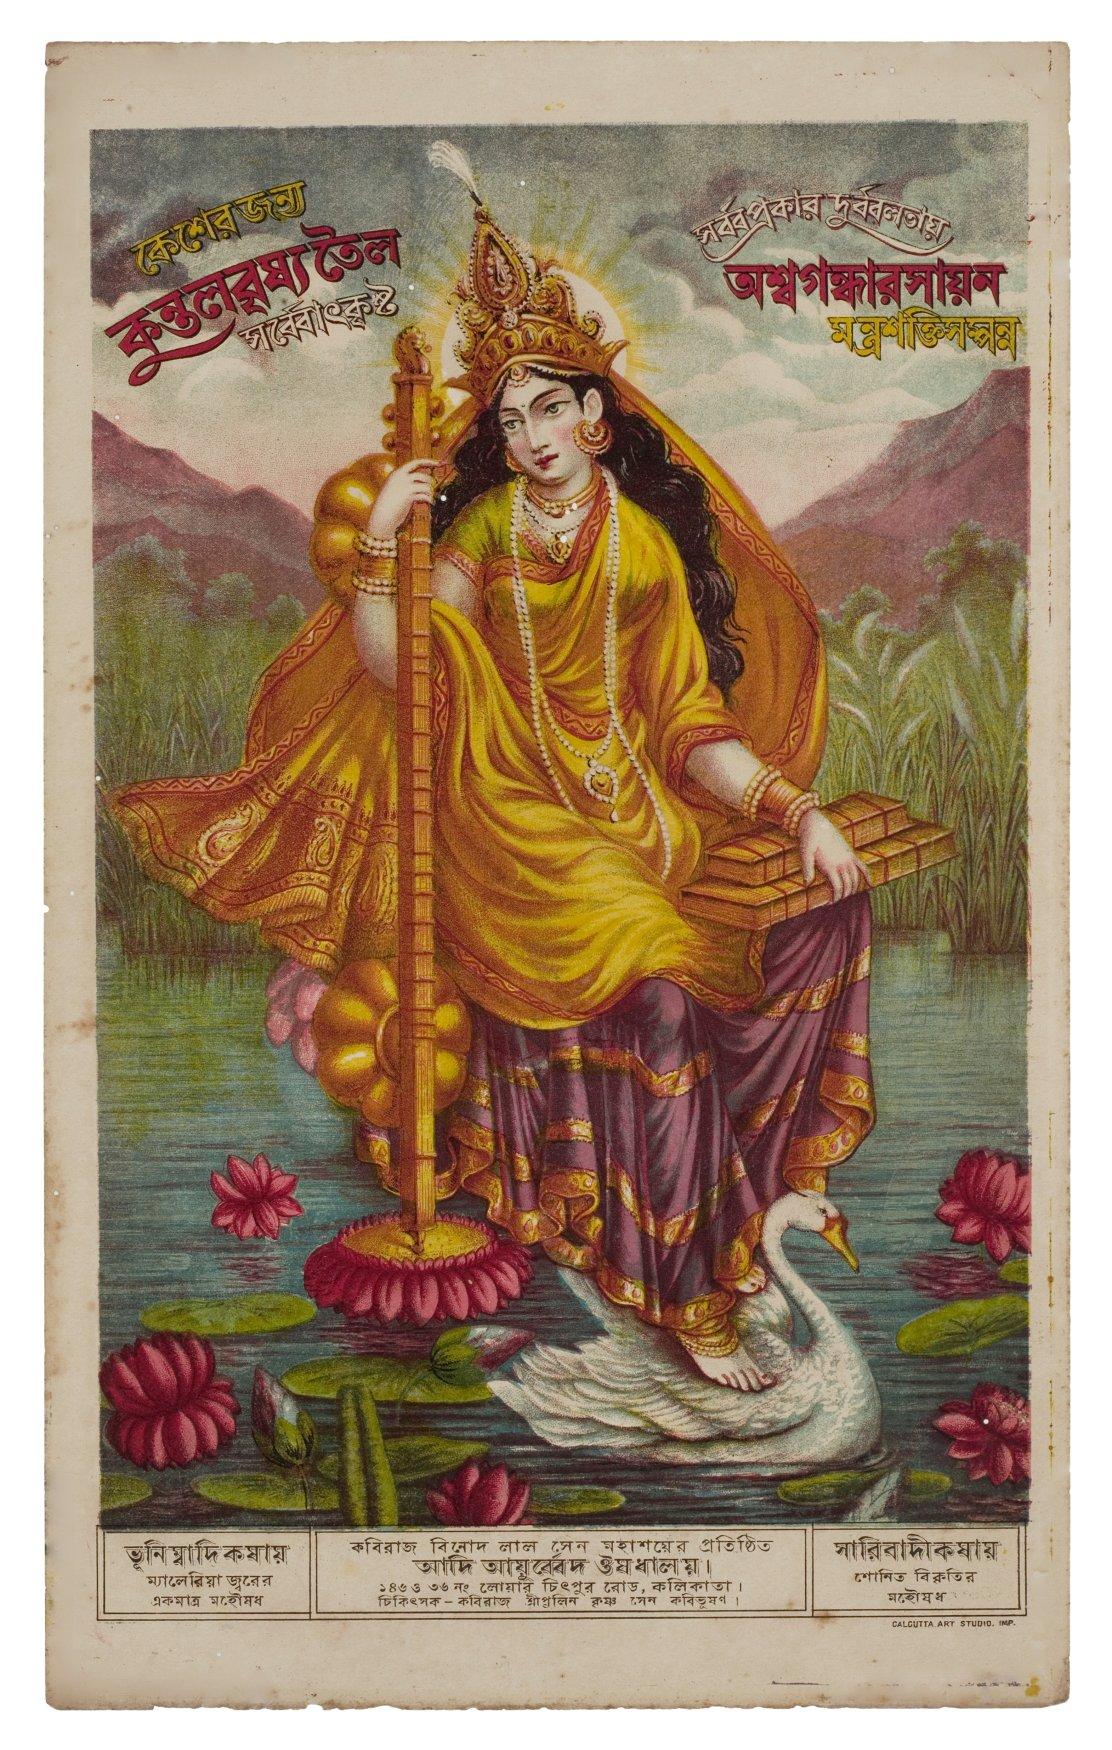 Goddess Saraswati - Calcutta Art Studio, Lithograph Print c1885-1890